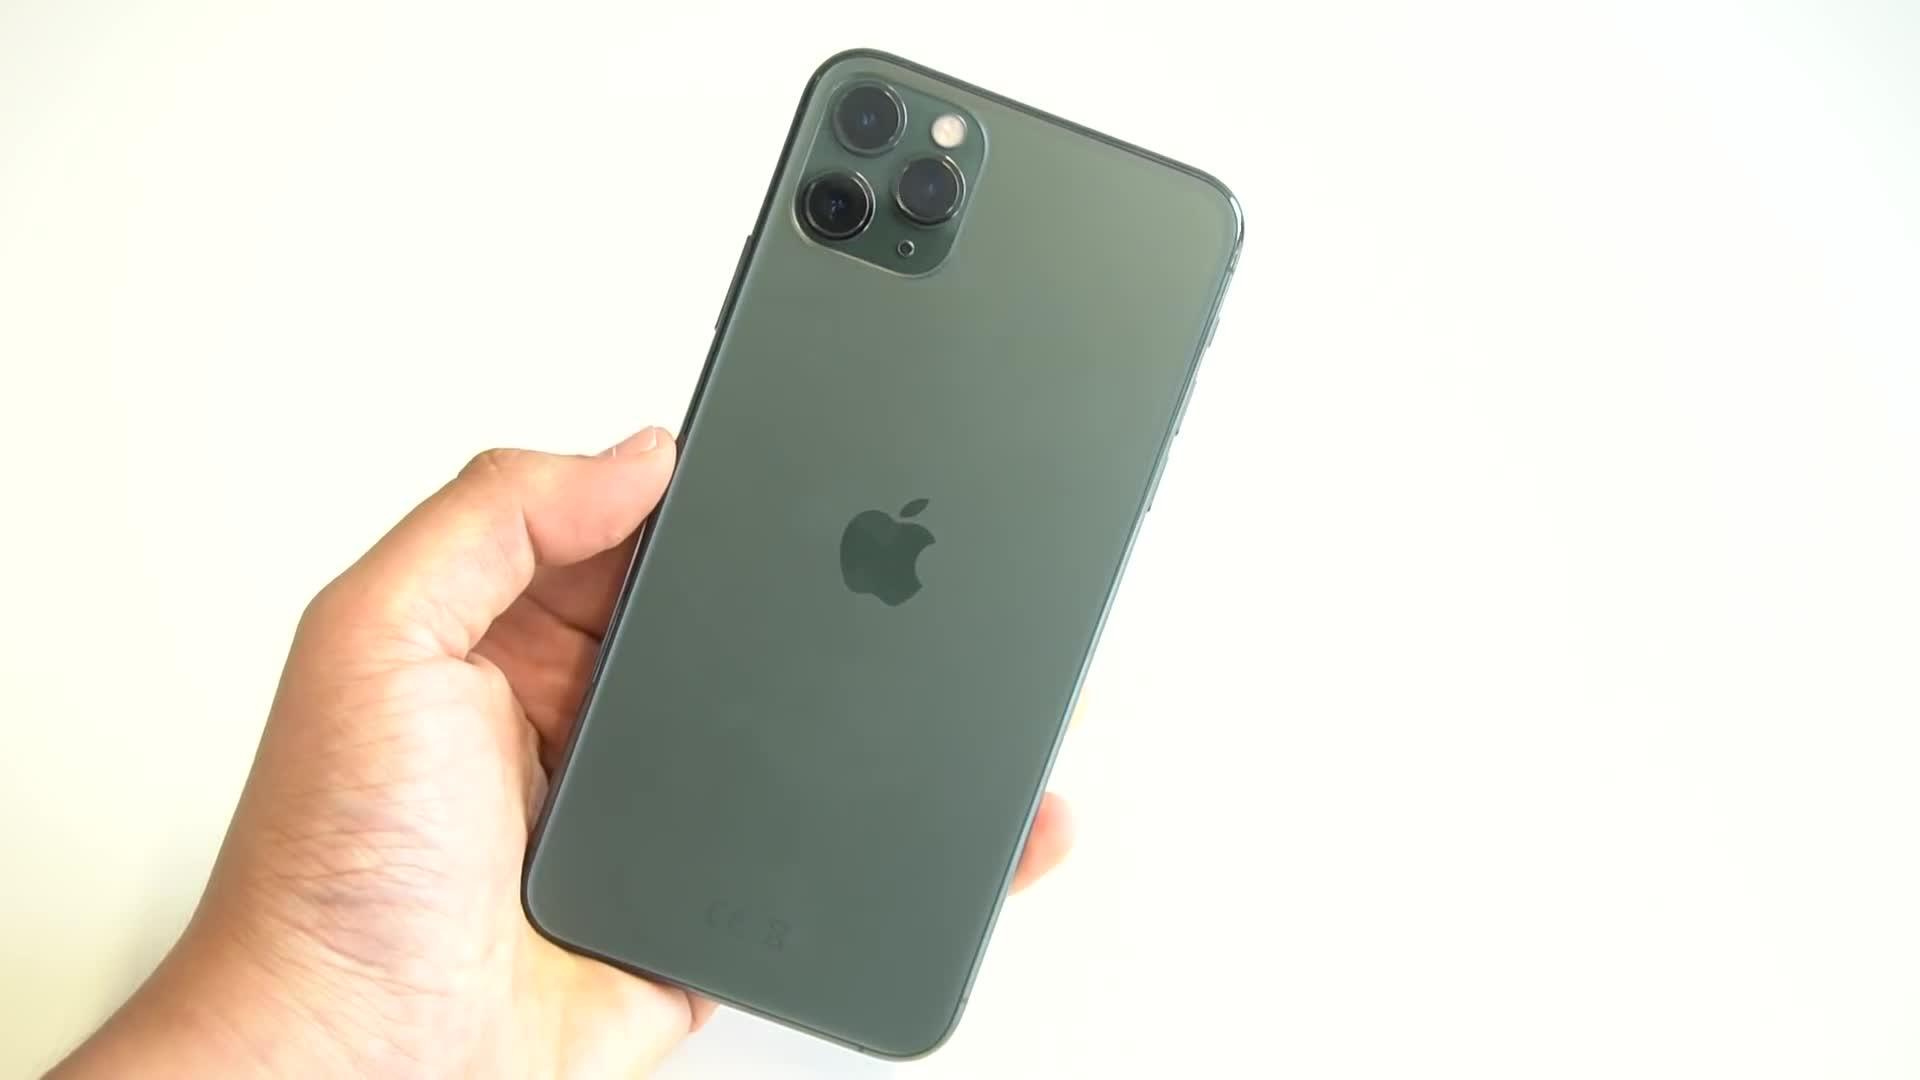 Smartphone, Apple, Iphone, NewGadgets, Johannes Knapp, Unboxing, iPhone 11 Pro Max, Apple Iphone 11 Pro Max